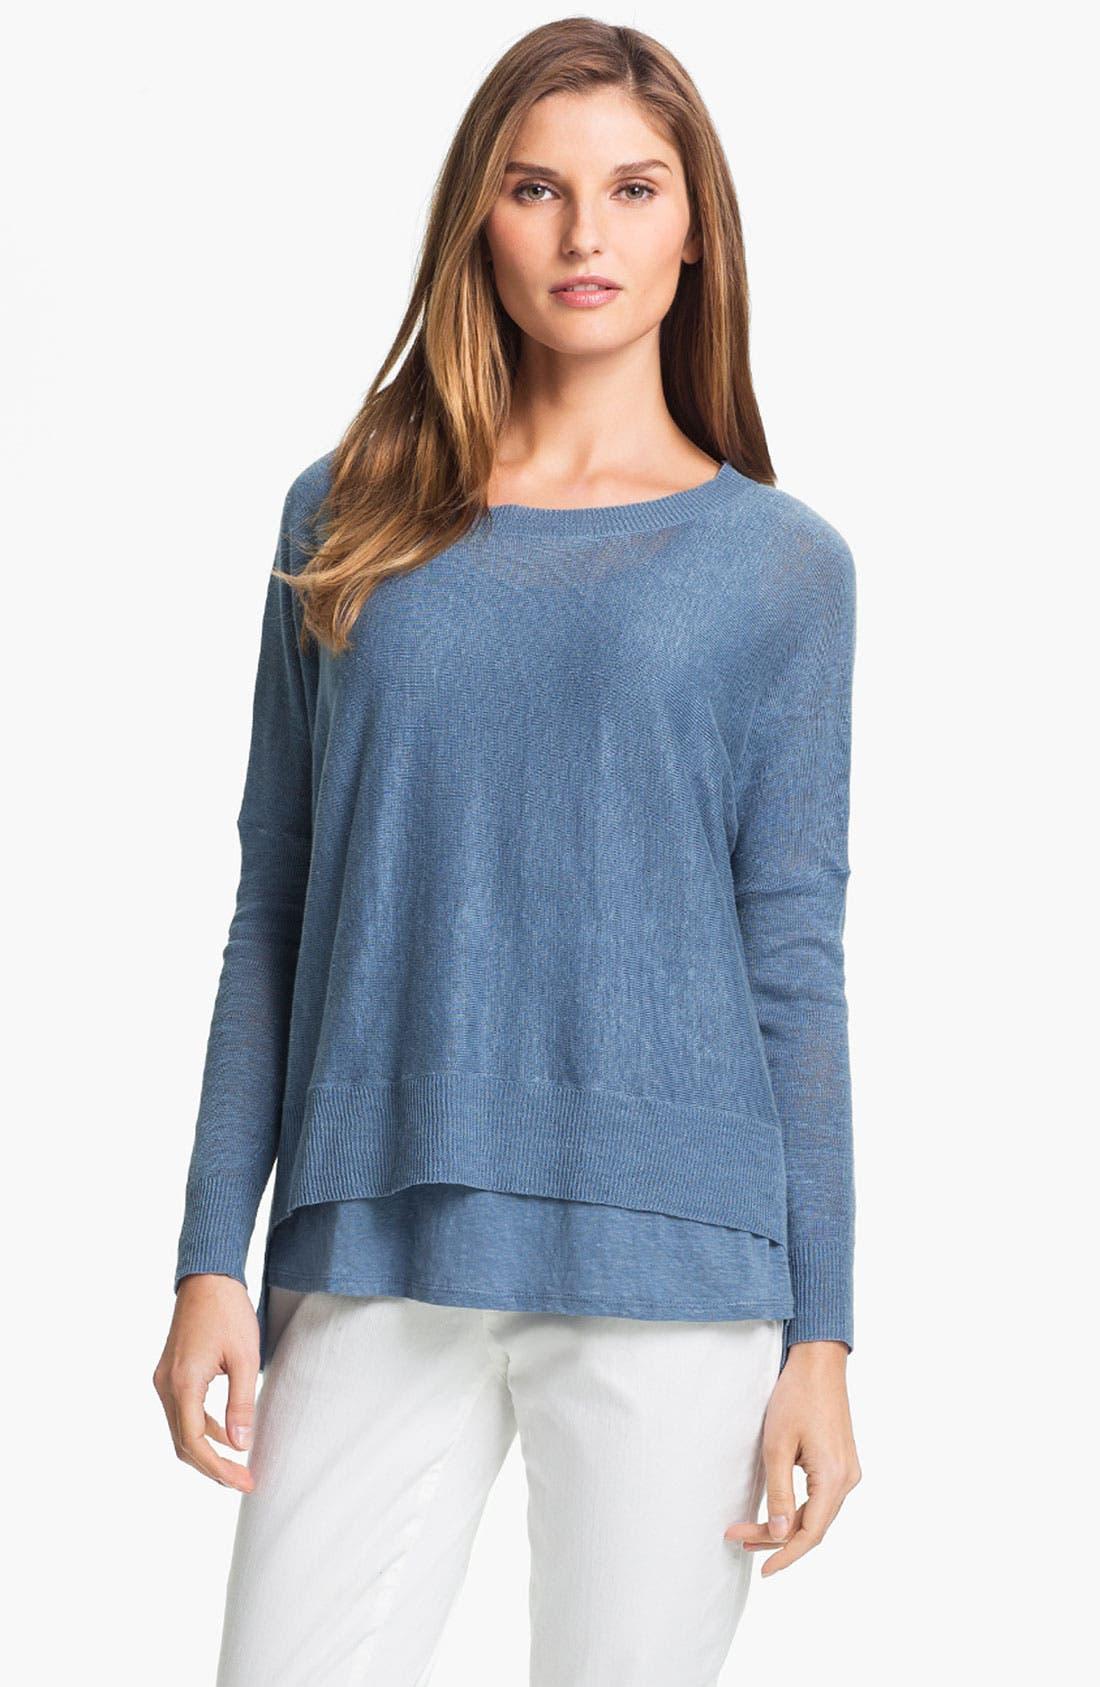 Alternate Image 1 Selected - Eileen Fisher Lightweight Linen Tunic